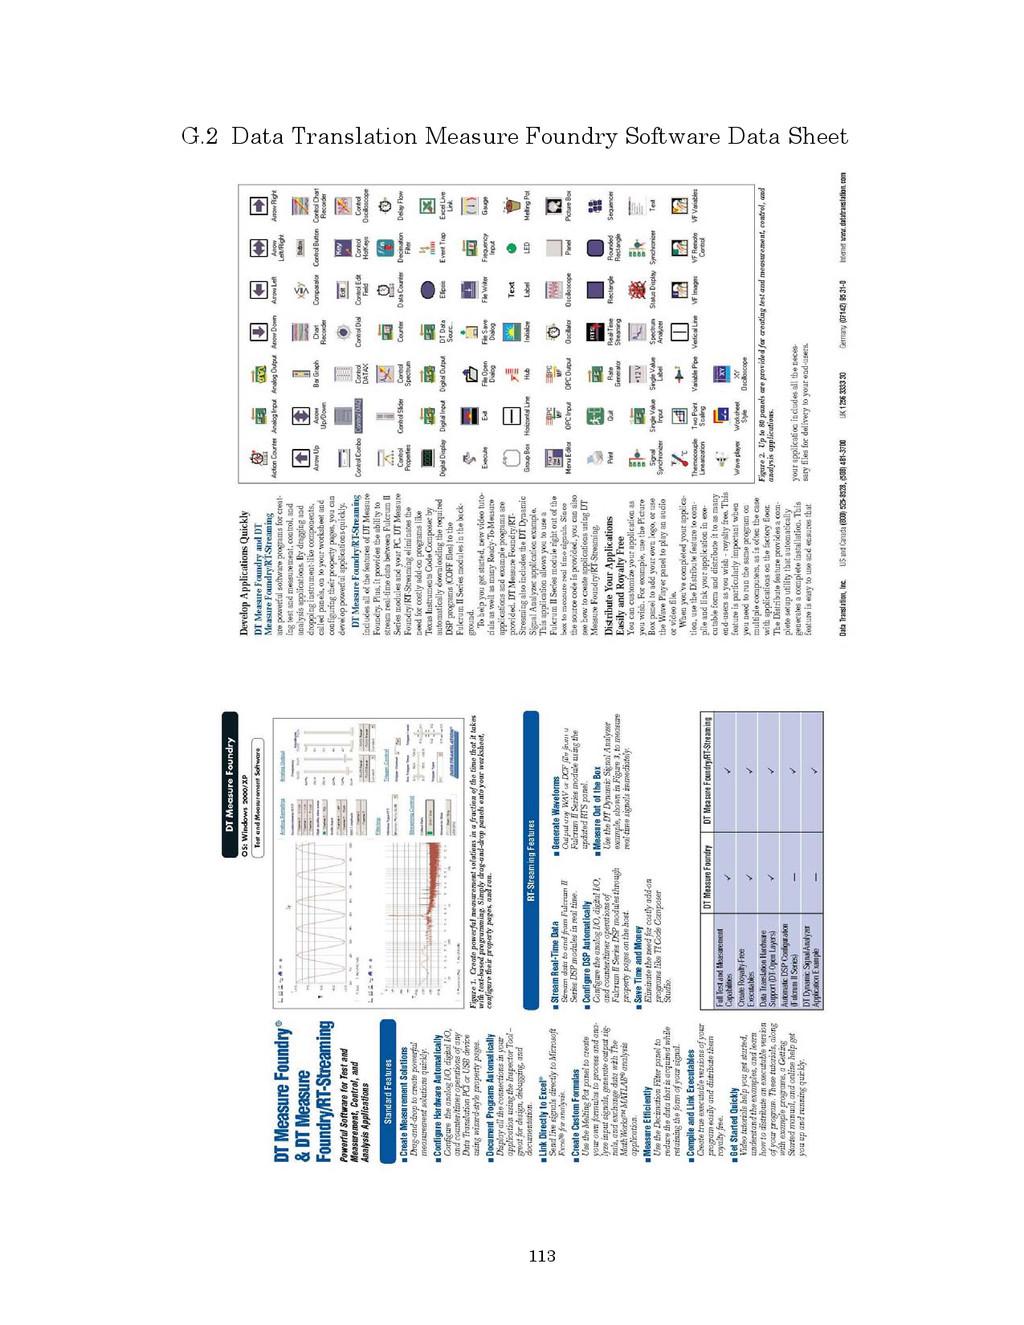 113 G.2 Data Translation Measure Foundry Softwa...